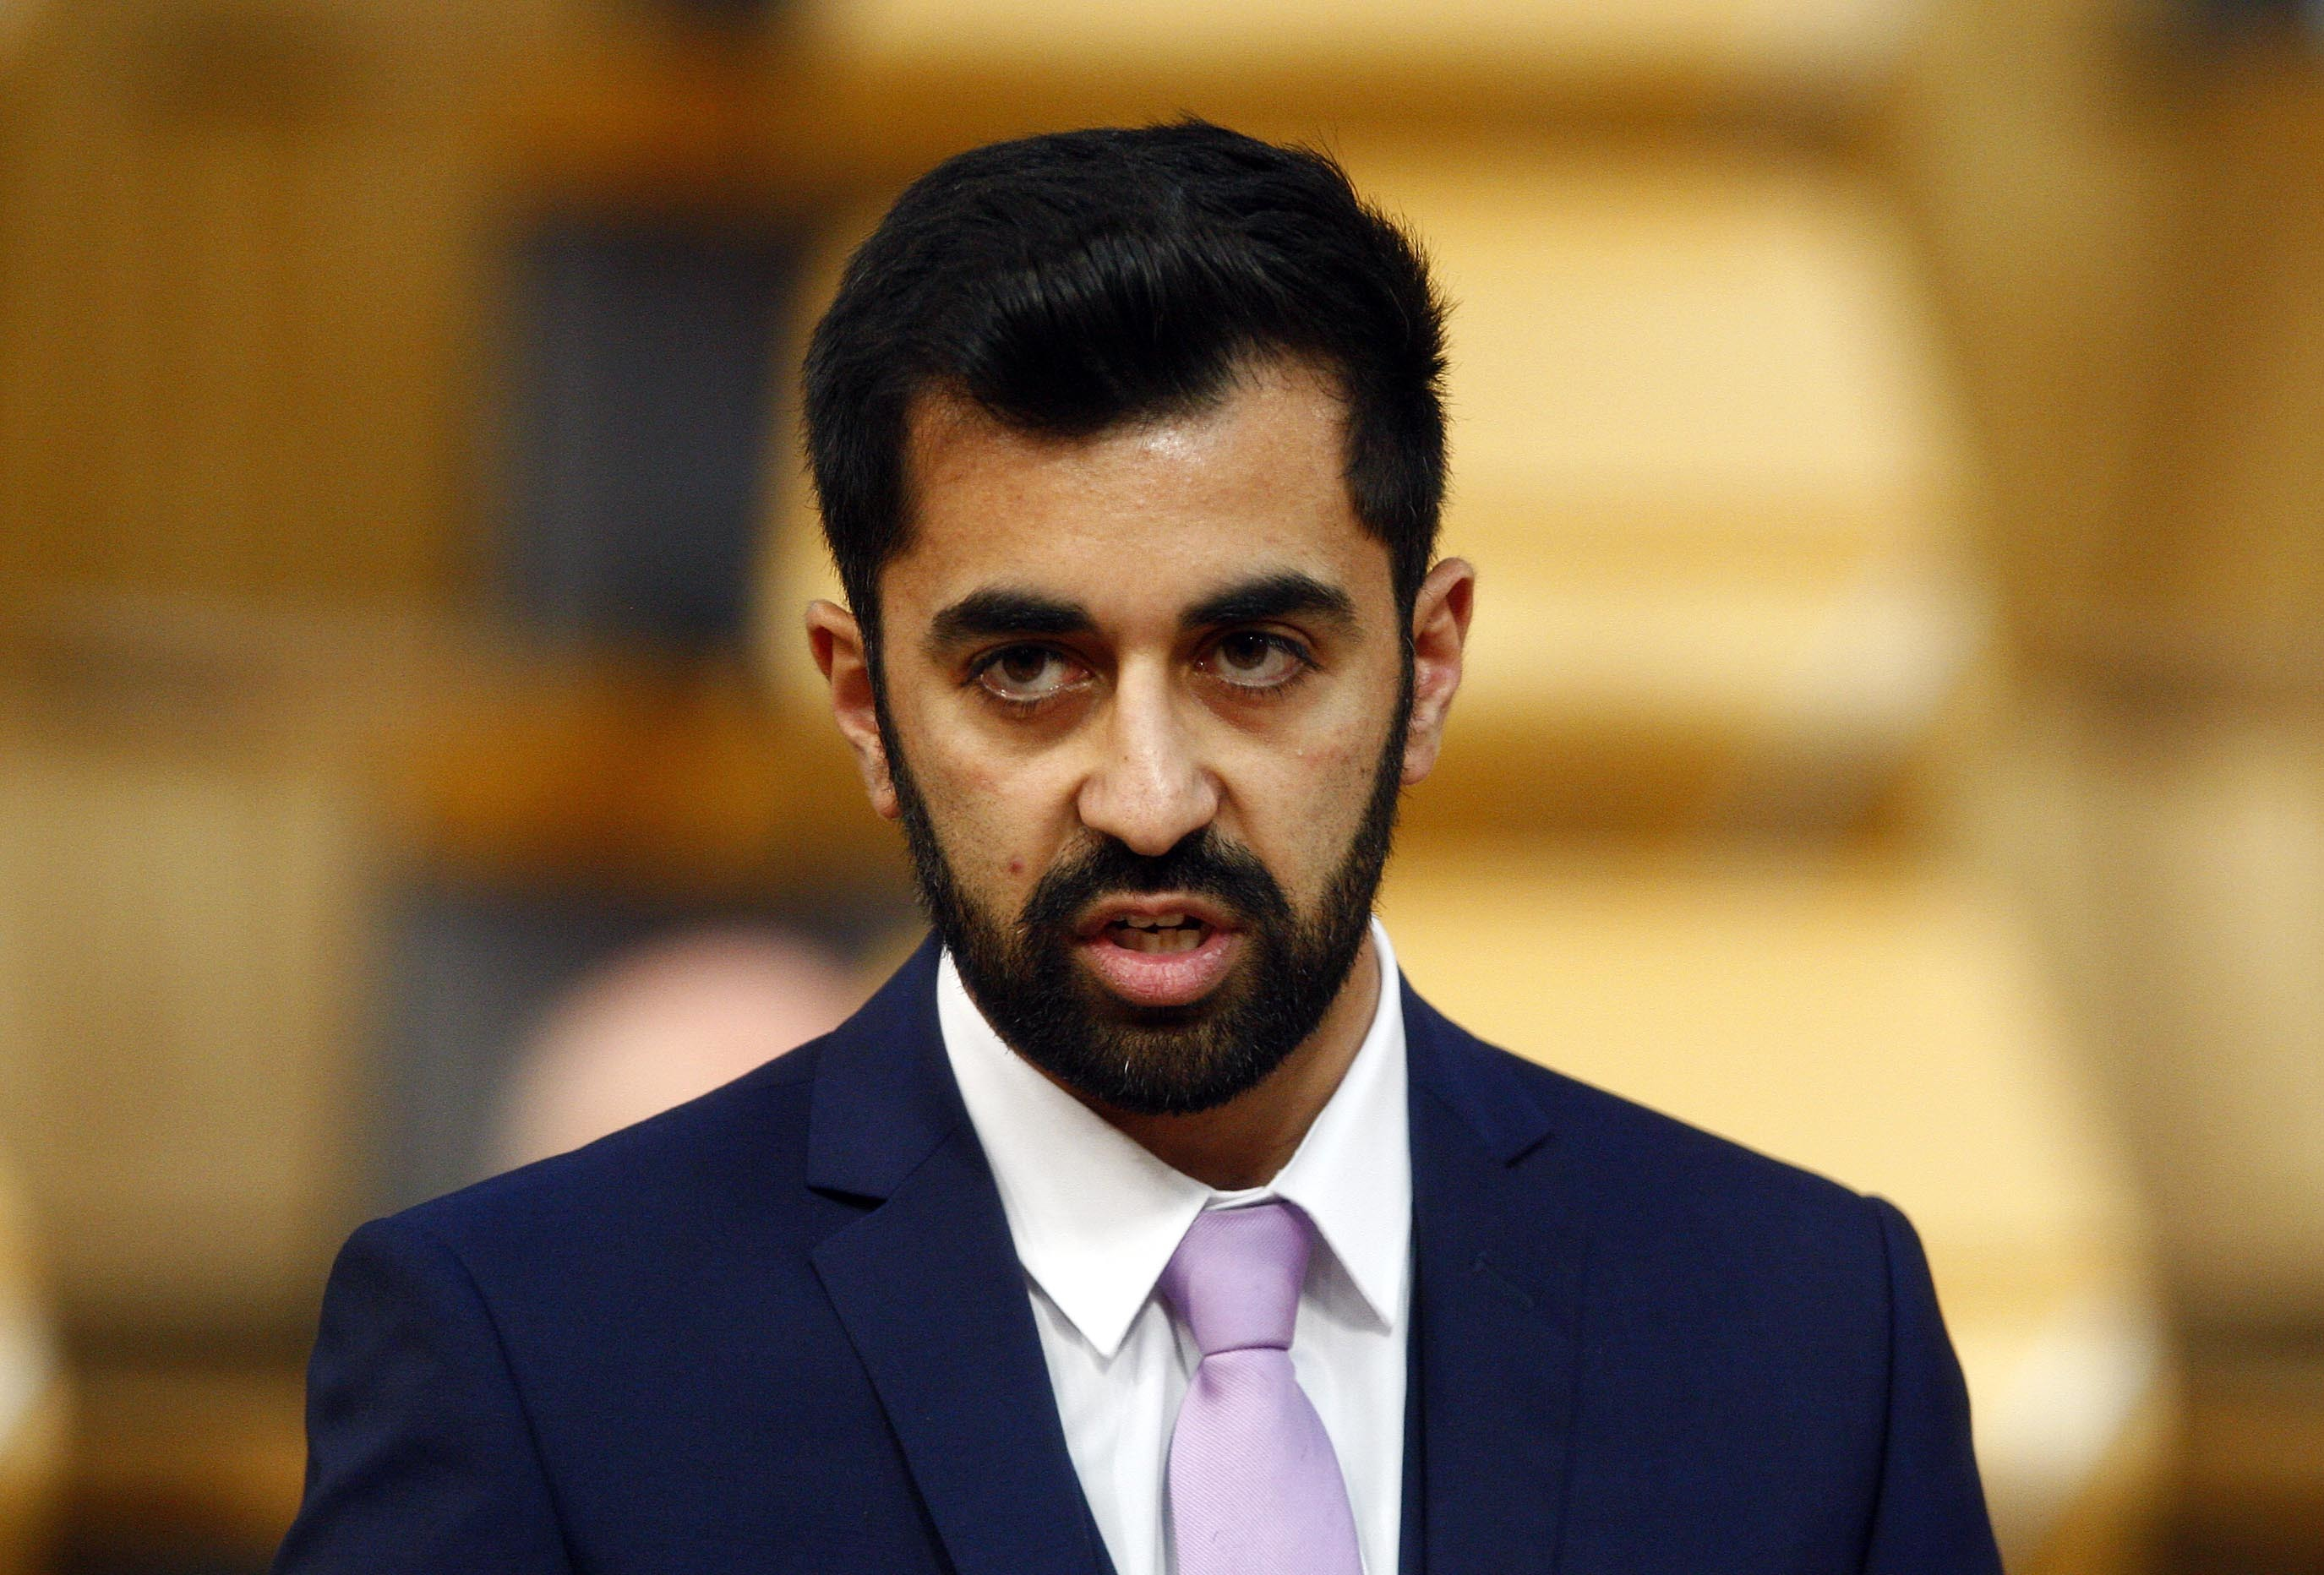 Justice Secretary Humza Yousaf.